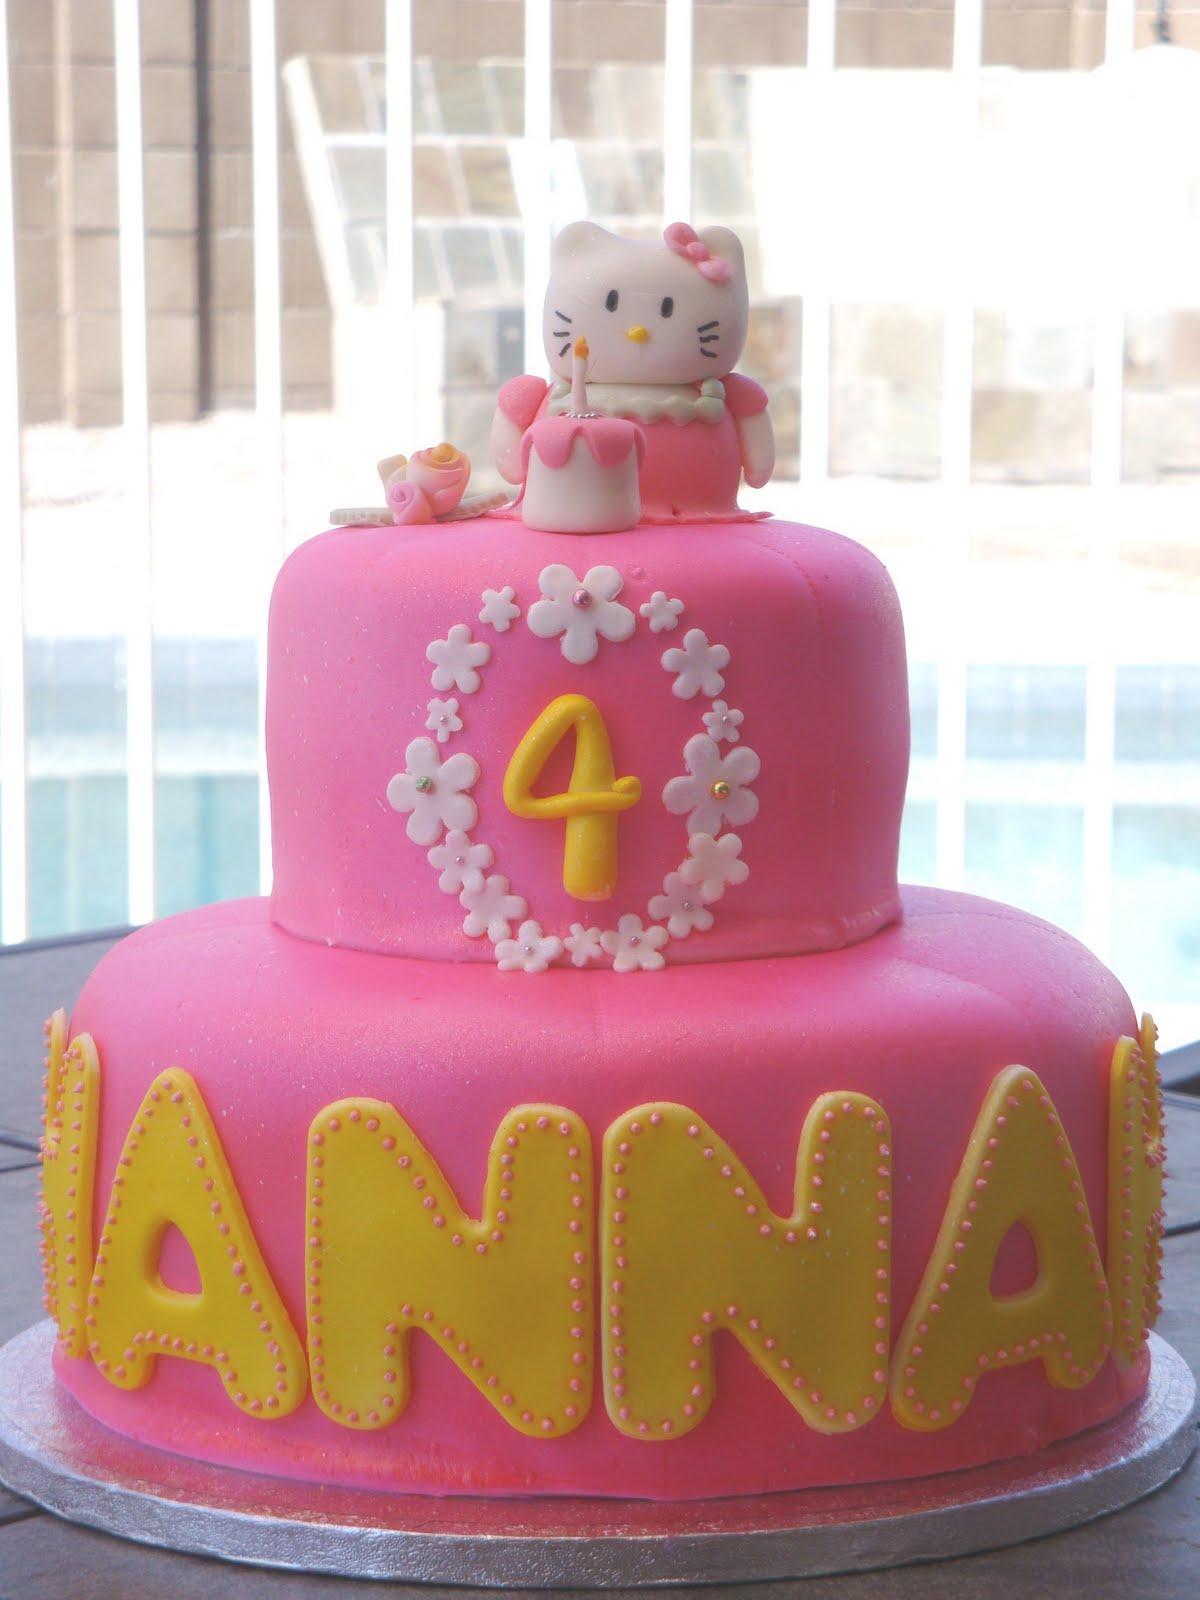 Birthday Cake Hijab Image Inspiration of Cake and Birthday Decoration